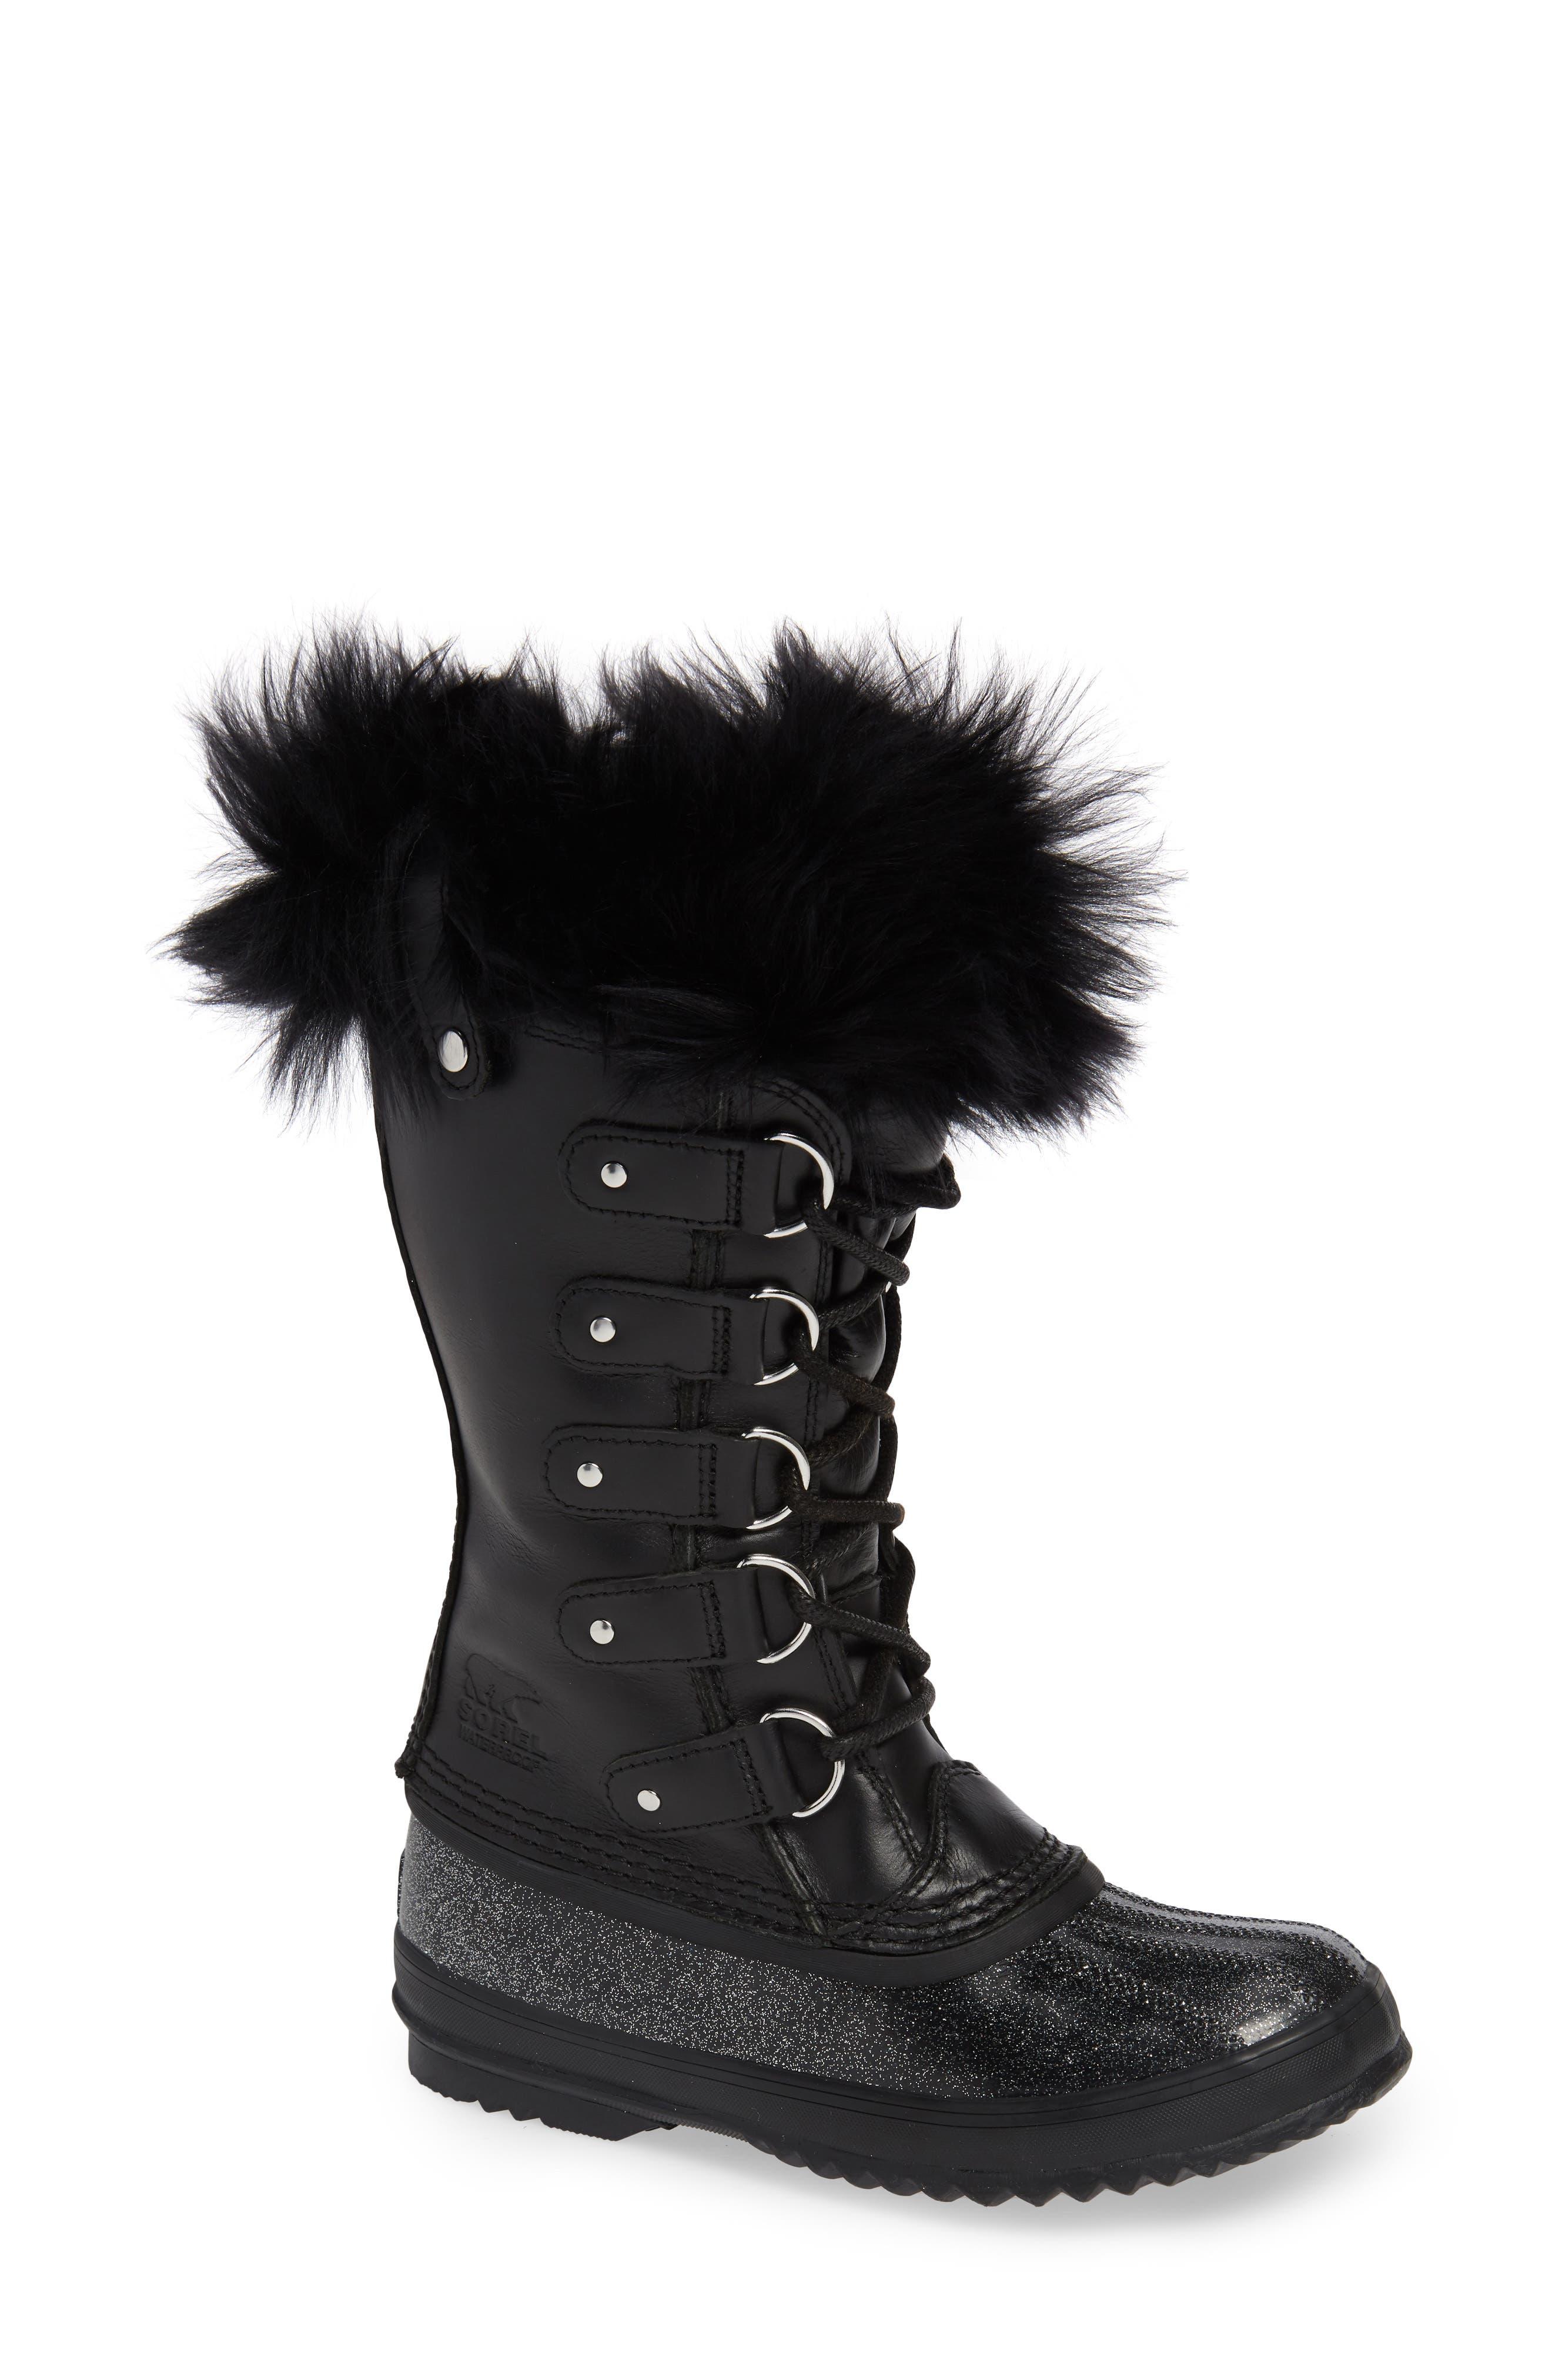 063fe14e46f  300 Women s Sorel Joan Of Arctic(TM) Lux Waterproof Winter Boot With  Genuine Shearling